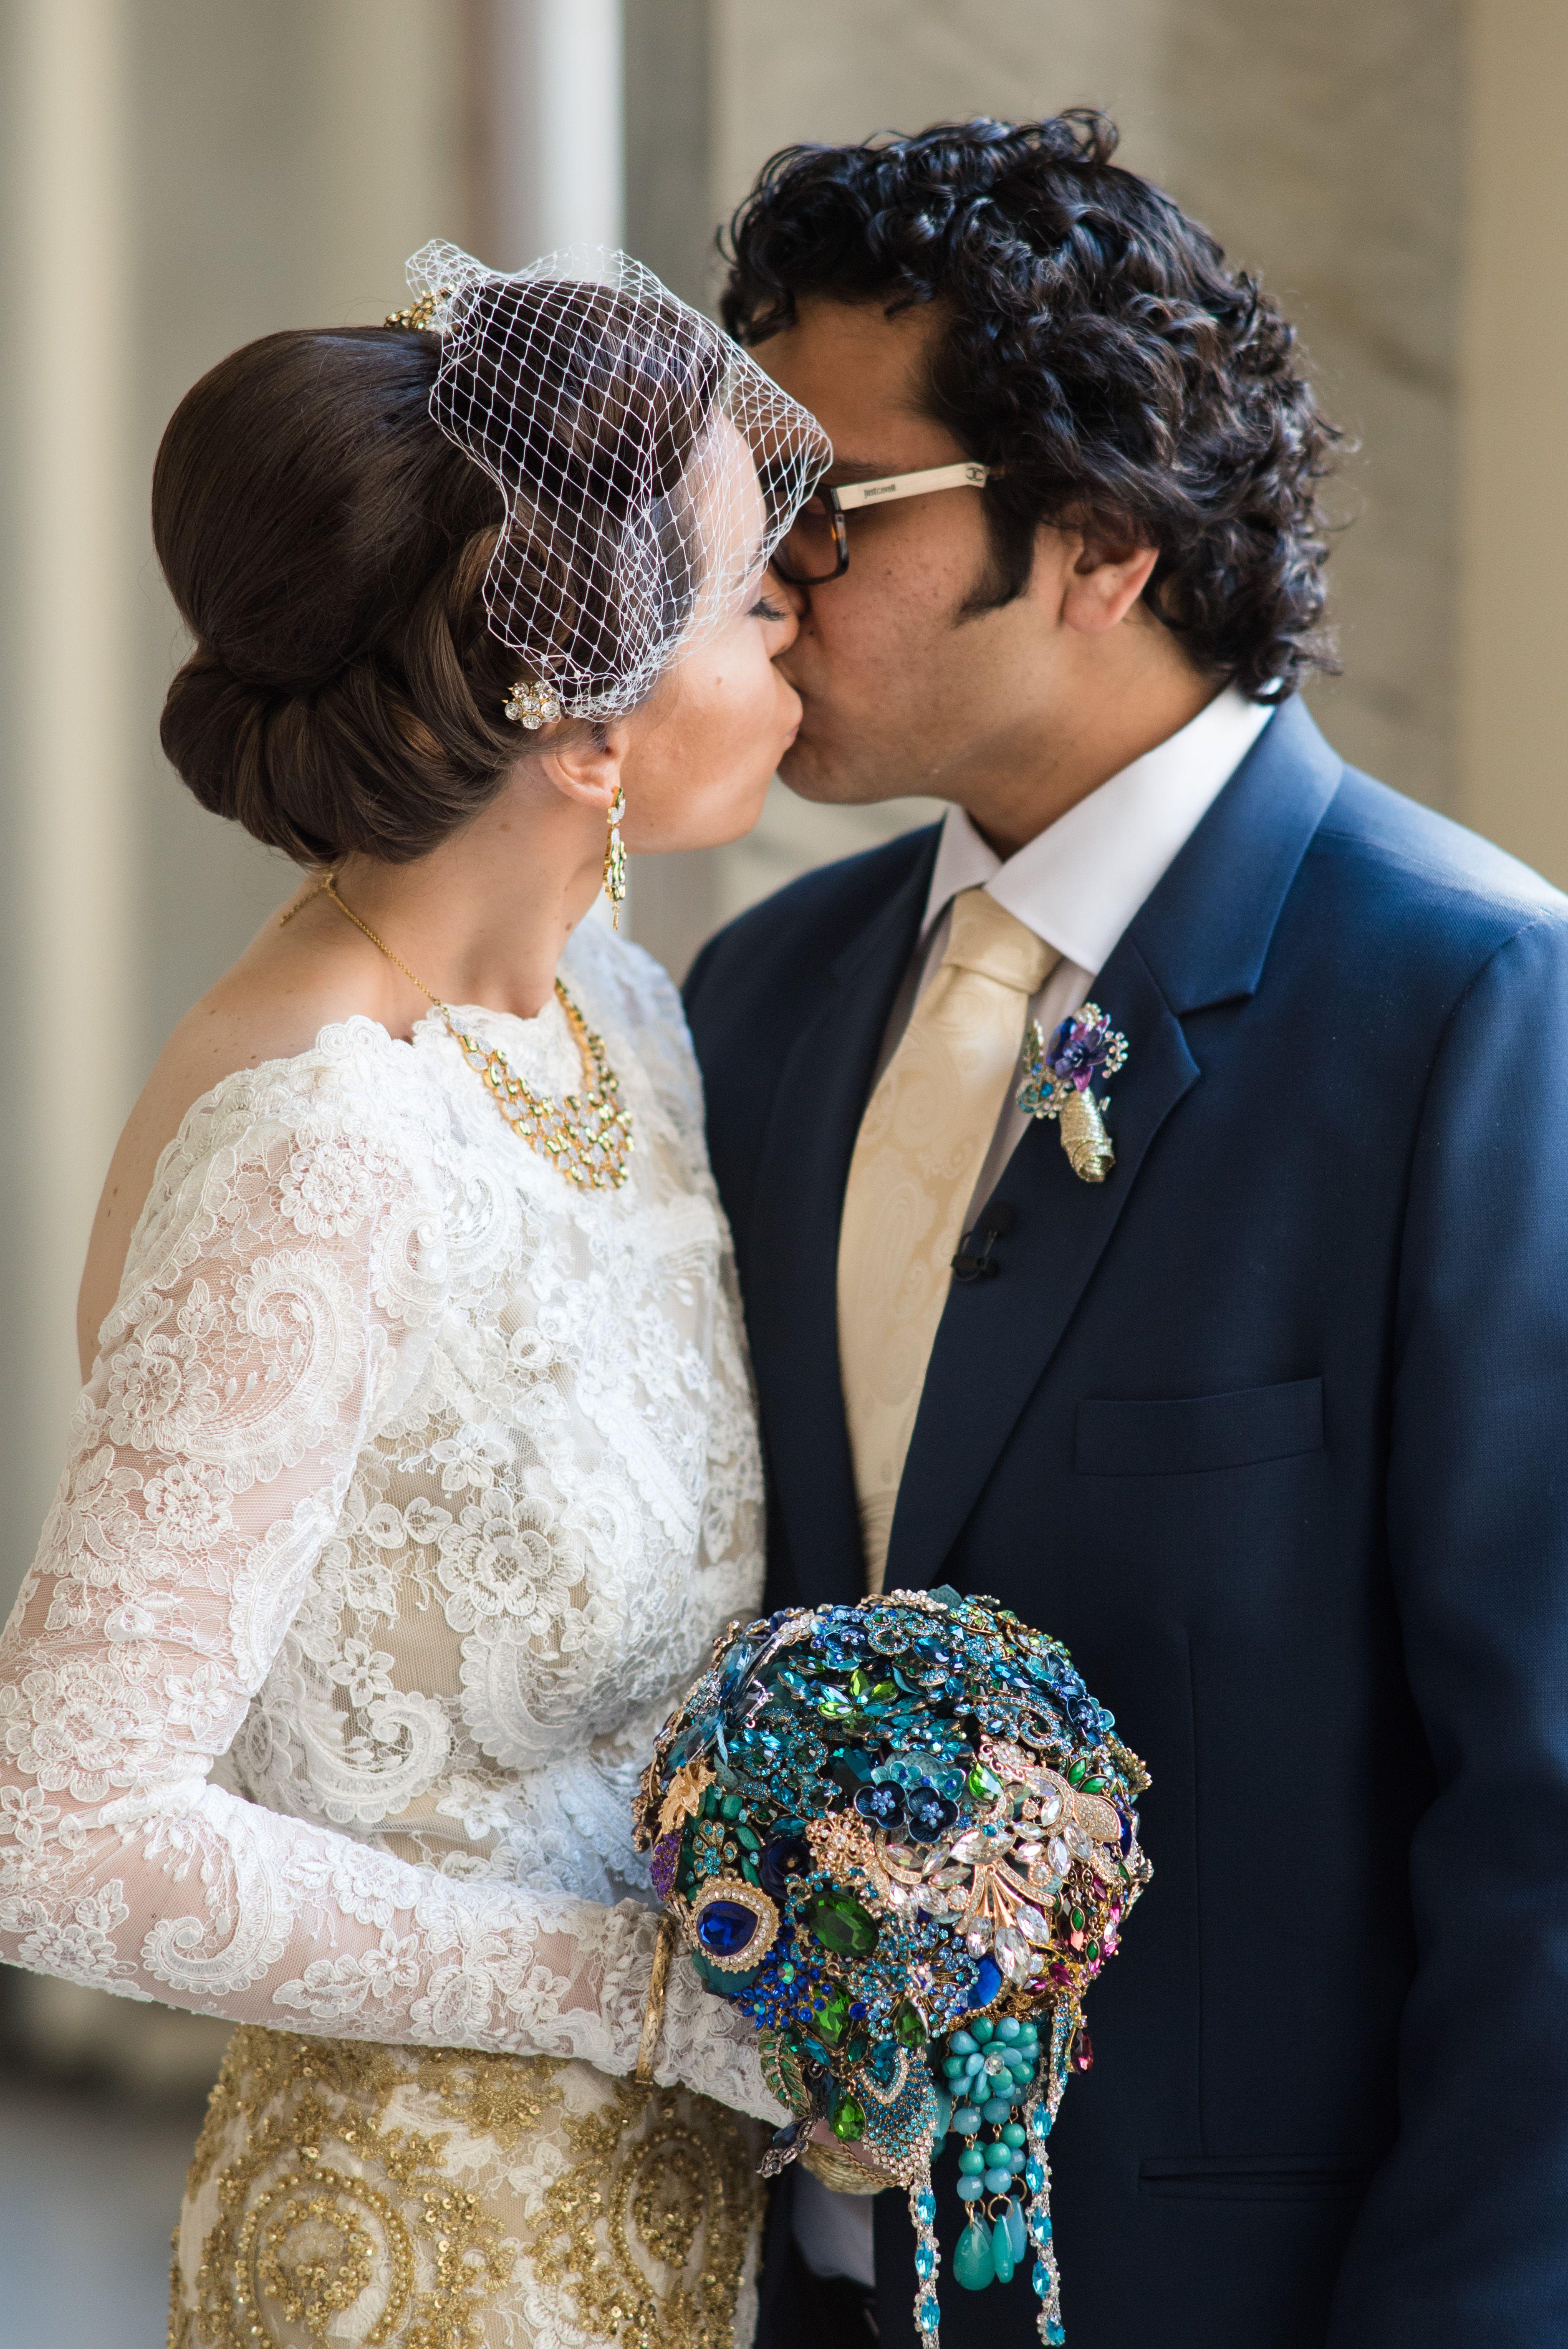 Brooch bouquet and boutonierre wedding pinterest wedding